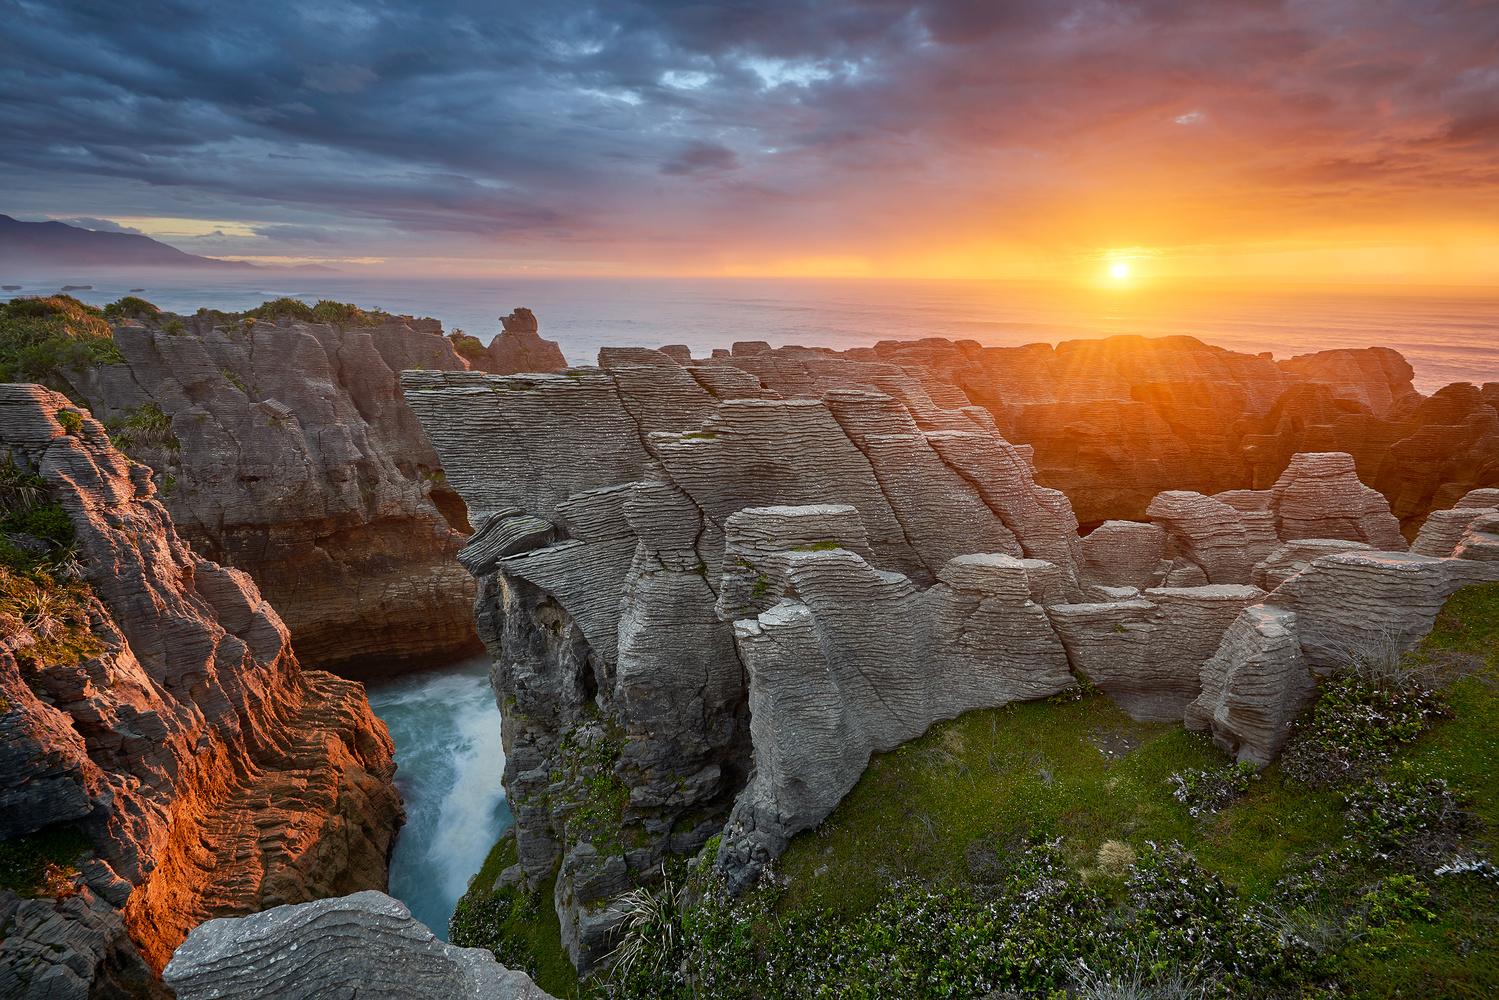 New zealand sunset at pancake rocks off coast of punakaiki for Landscaping rocks auckland